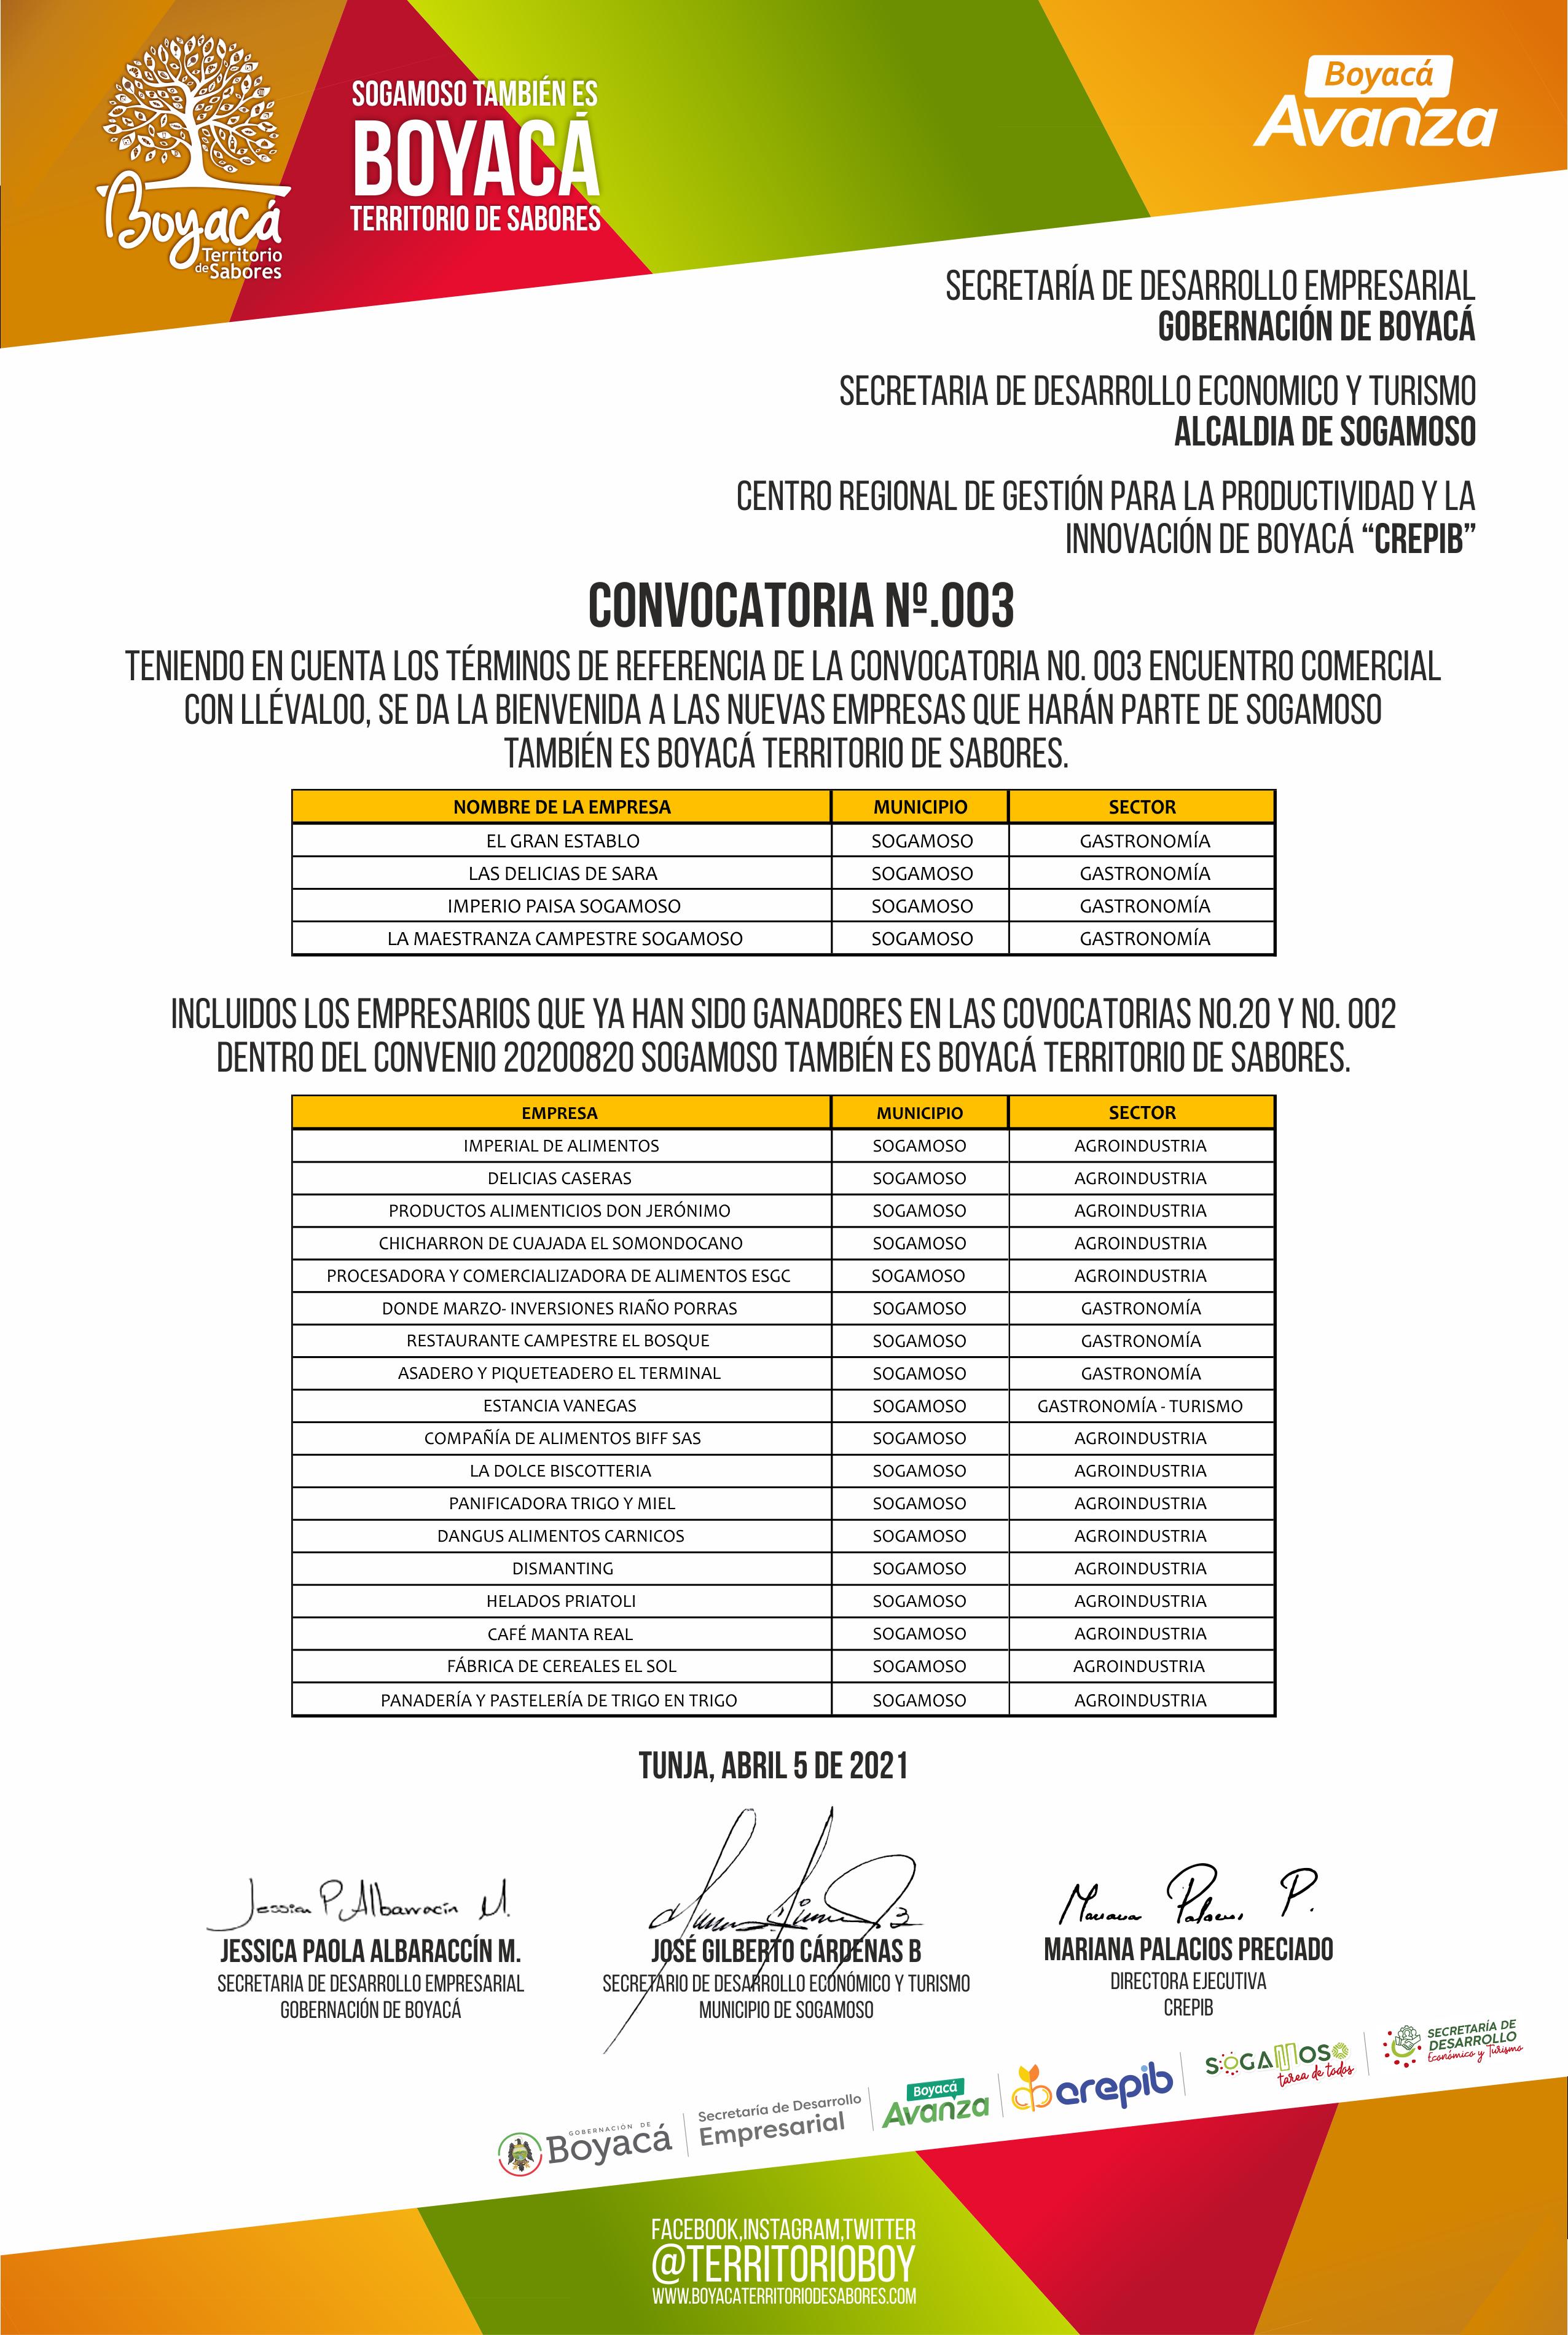 Acta-Seleccionados-Convocatoria-N-003